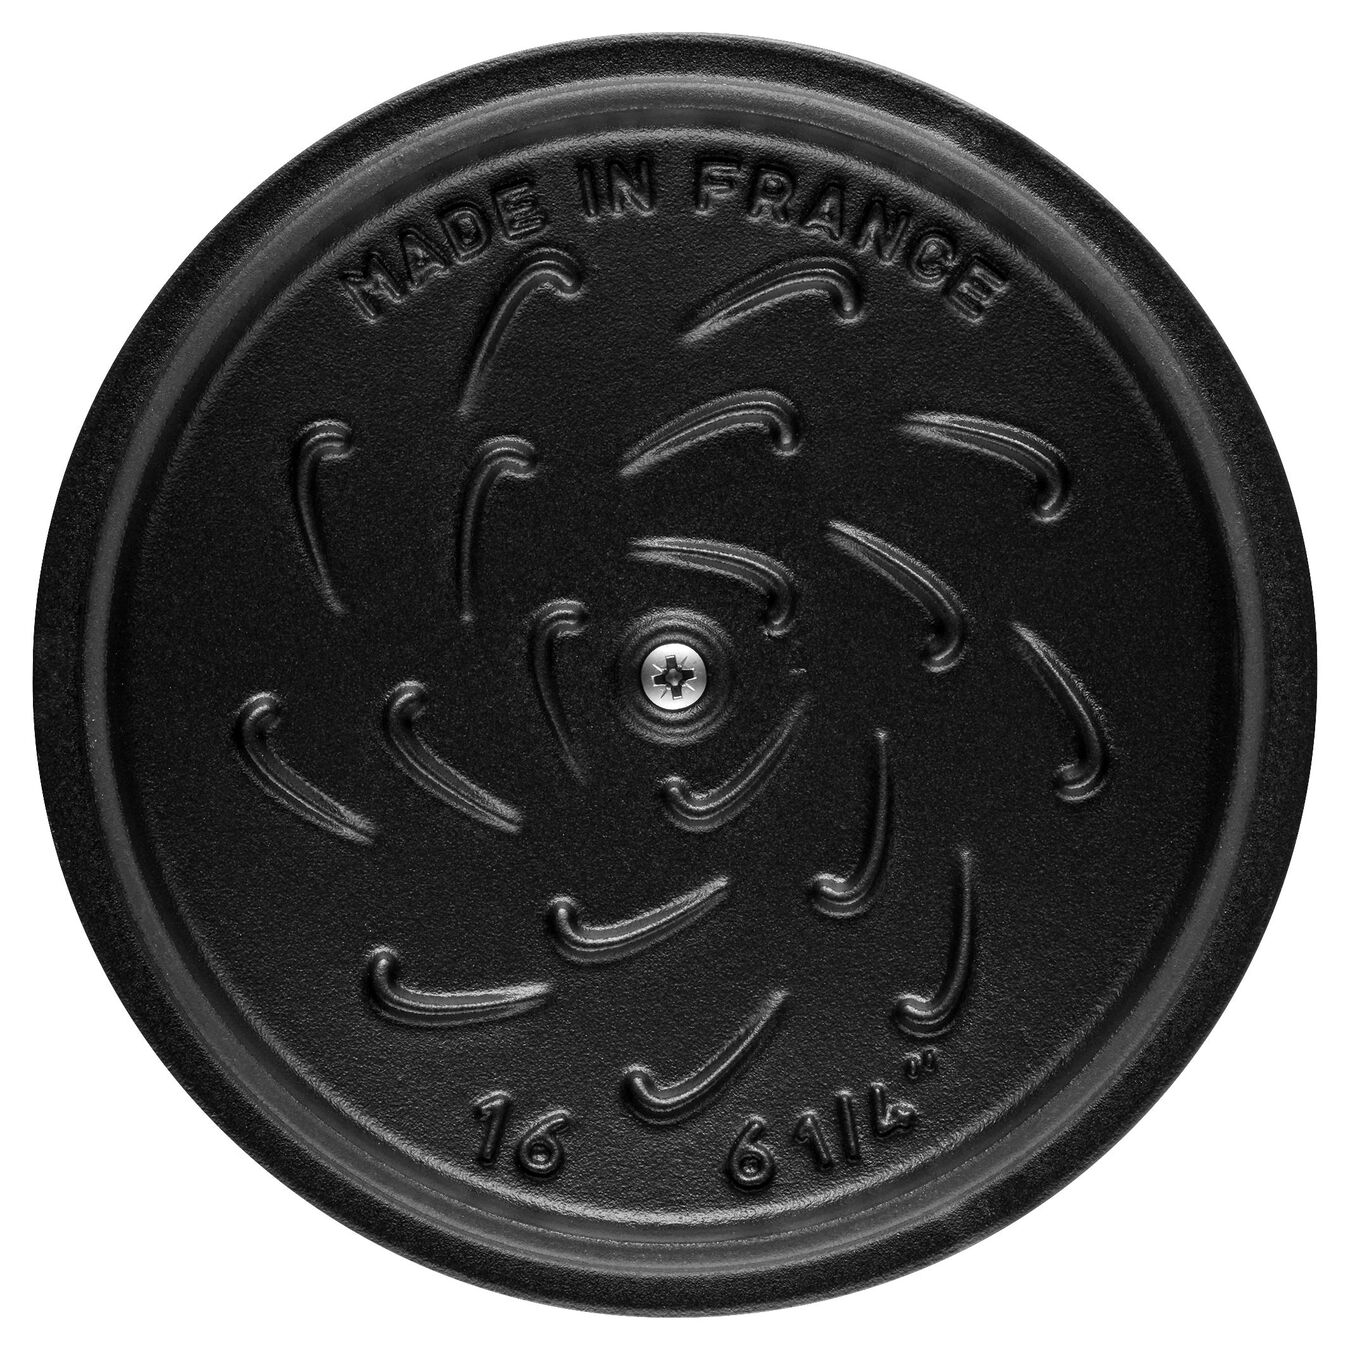 1.5 l Cast iron round Rice Cocotte, Black,,large 4